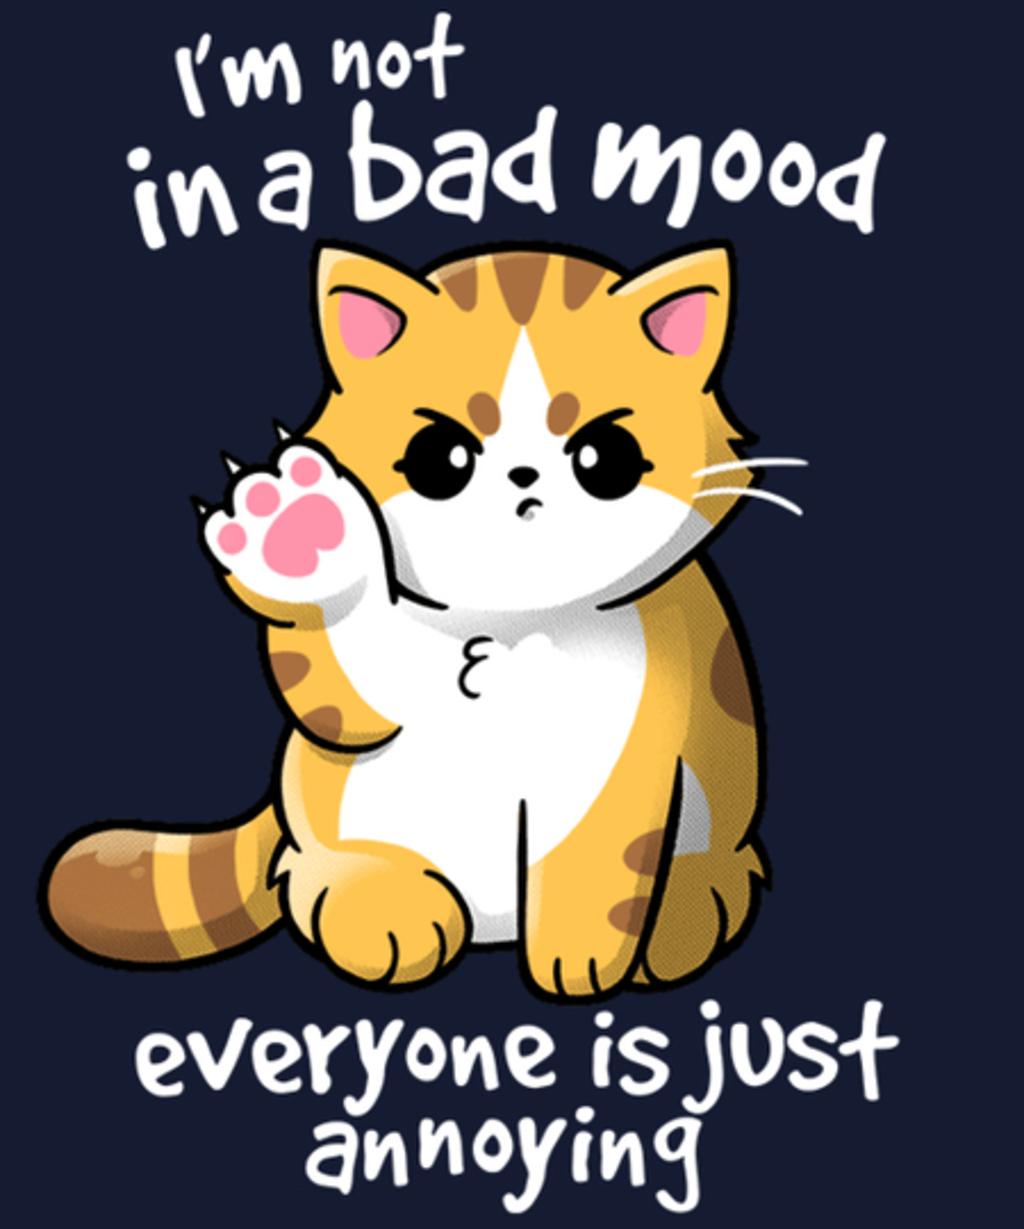 Qwertee: Bad mood